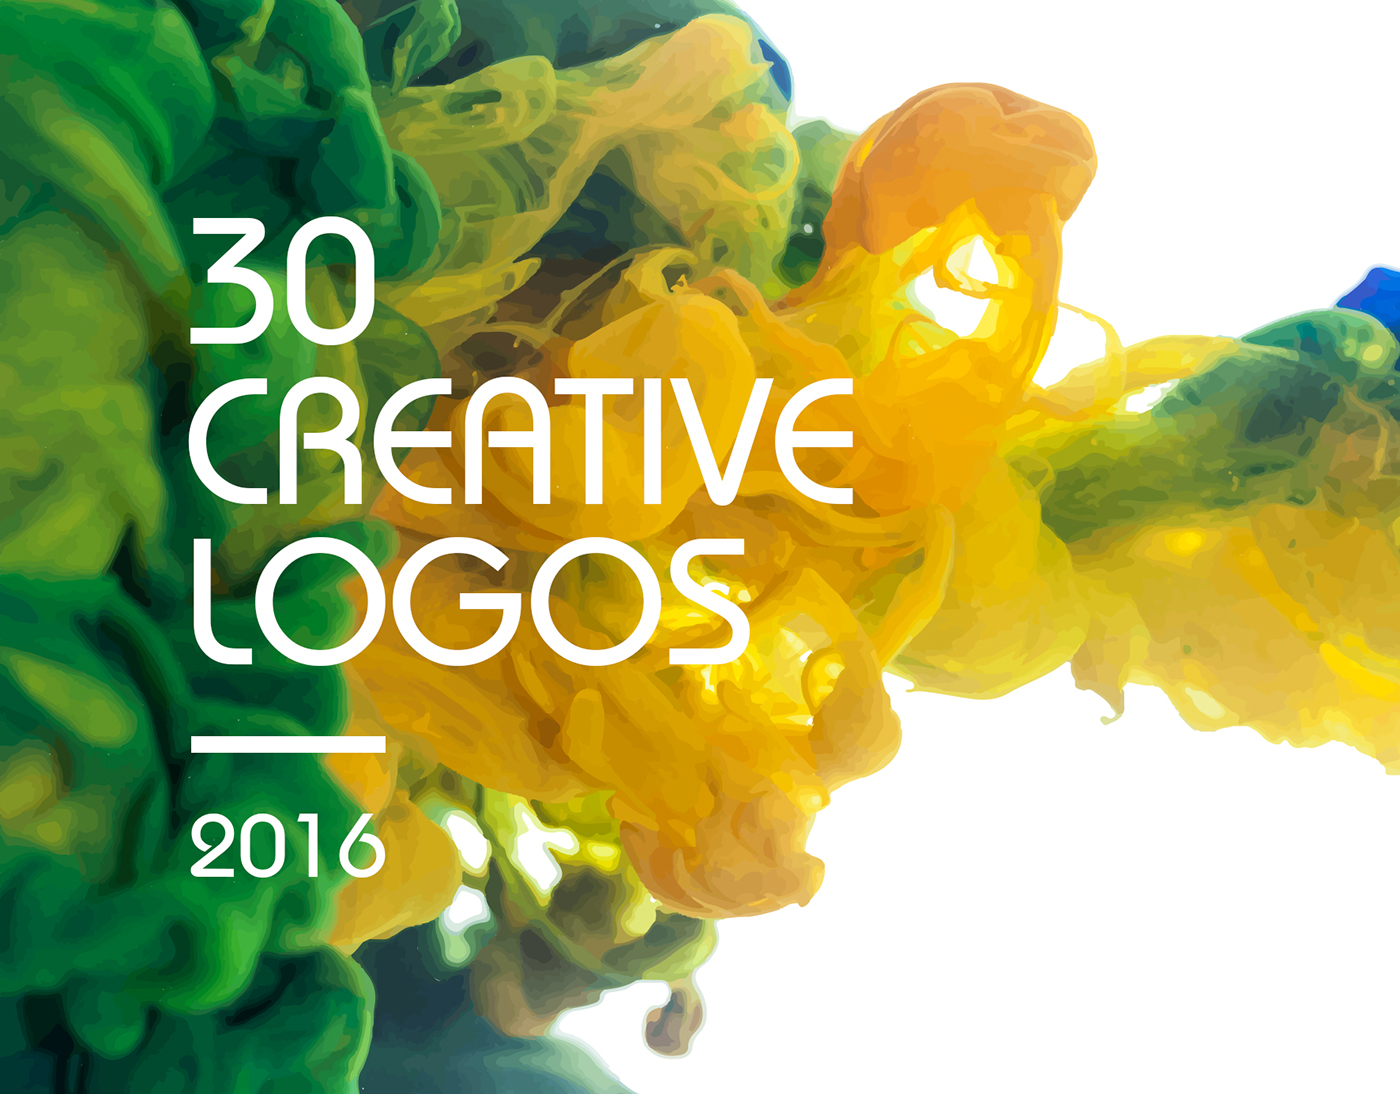 N Letter Love Best 30 Creative Logos...